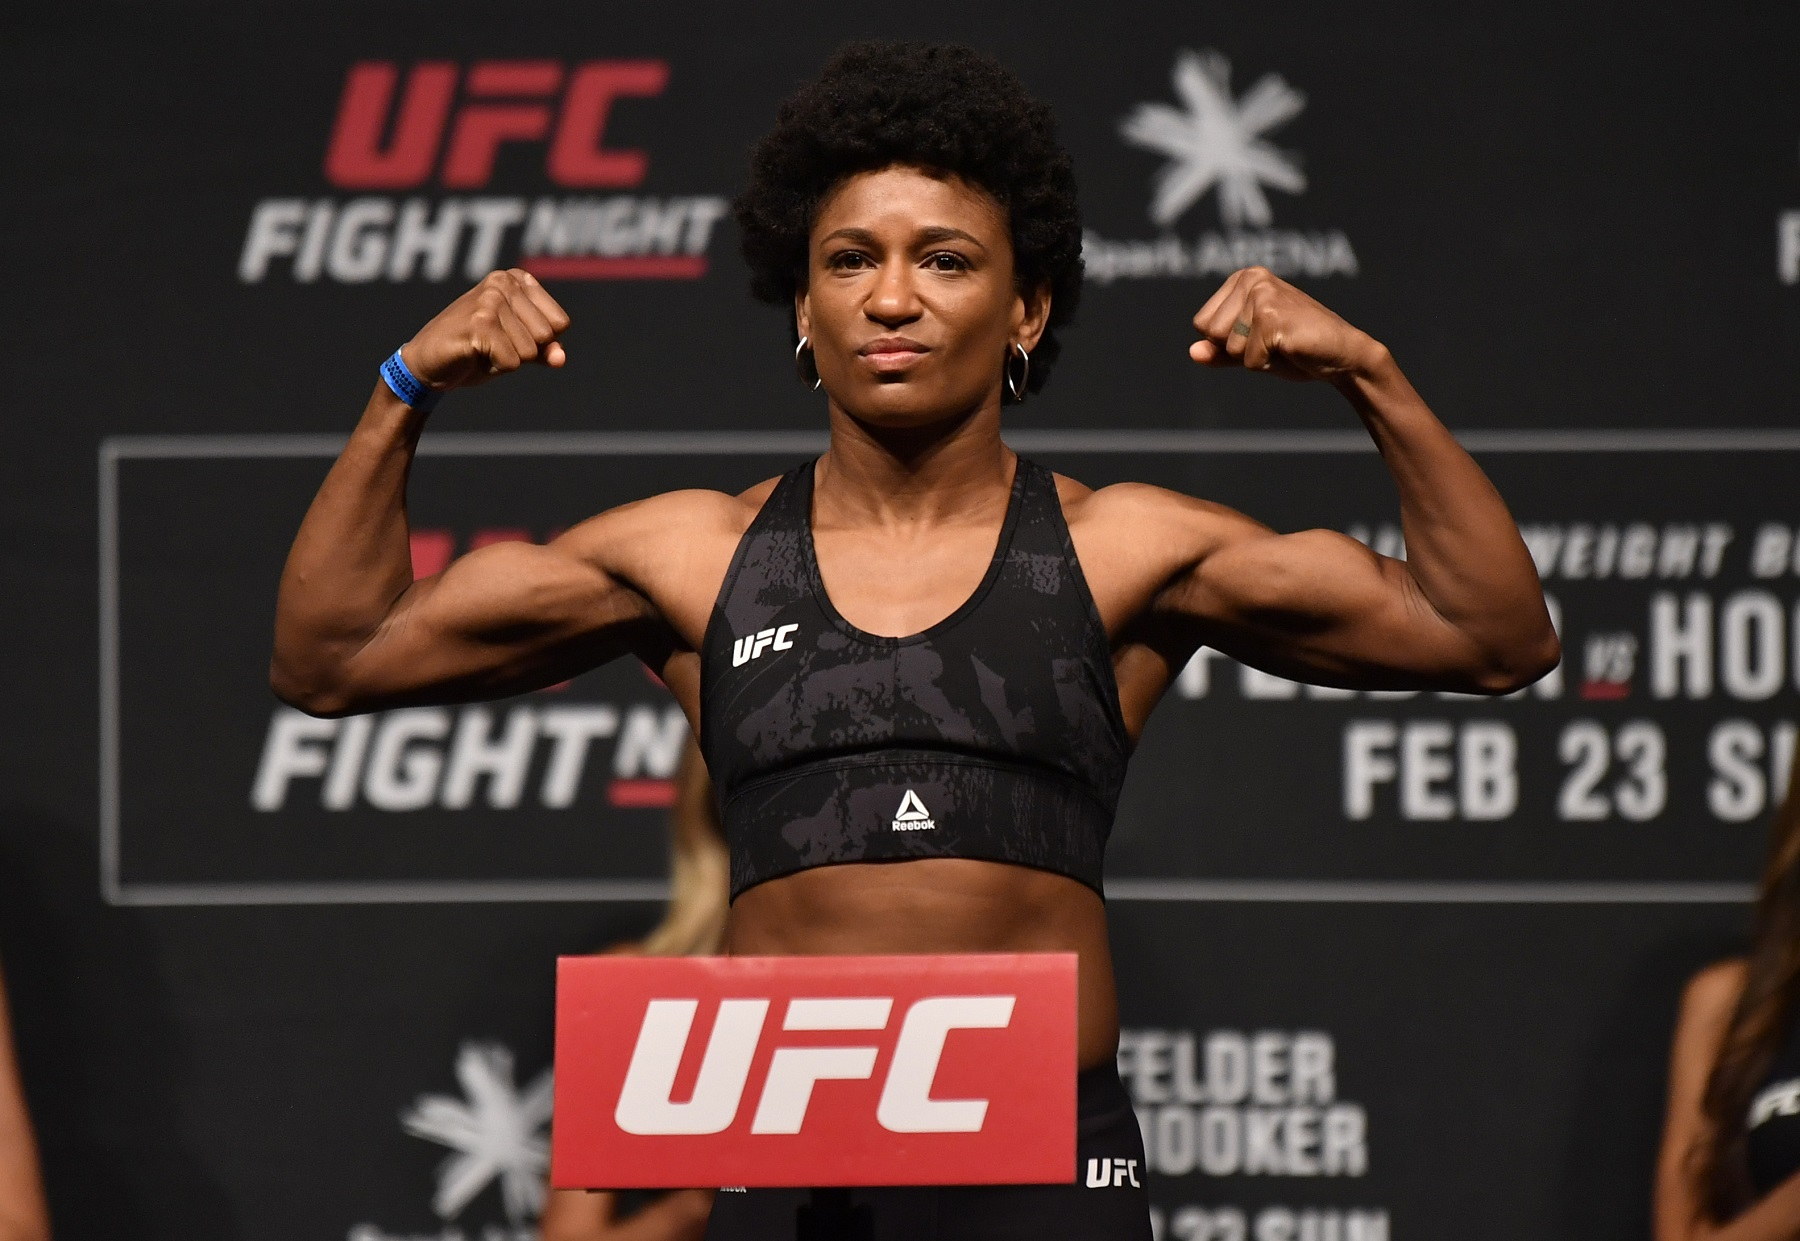 UFC fighter Angela Hill